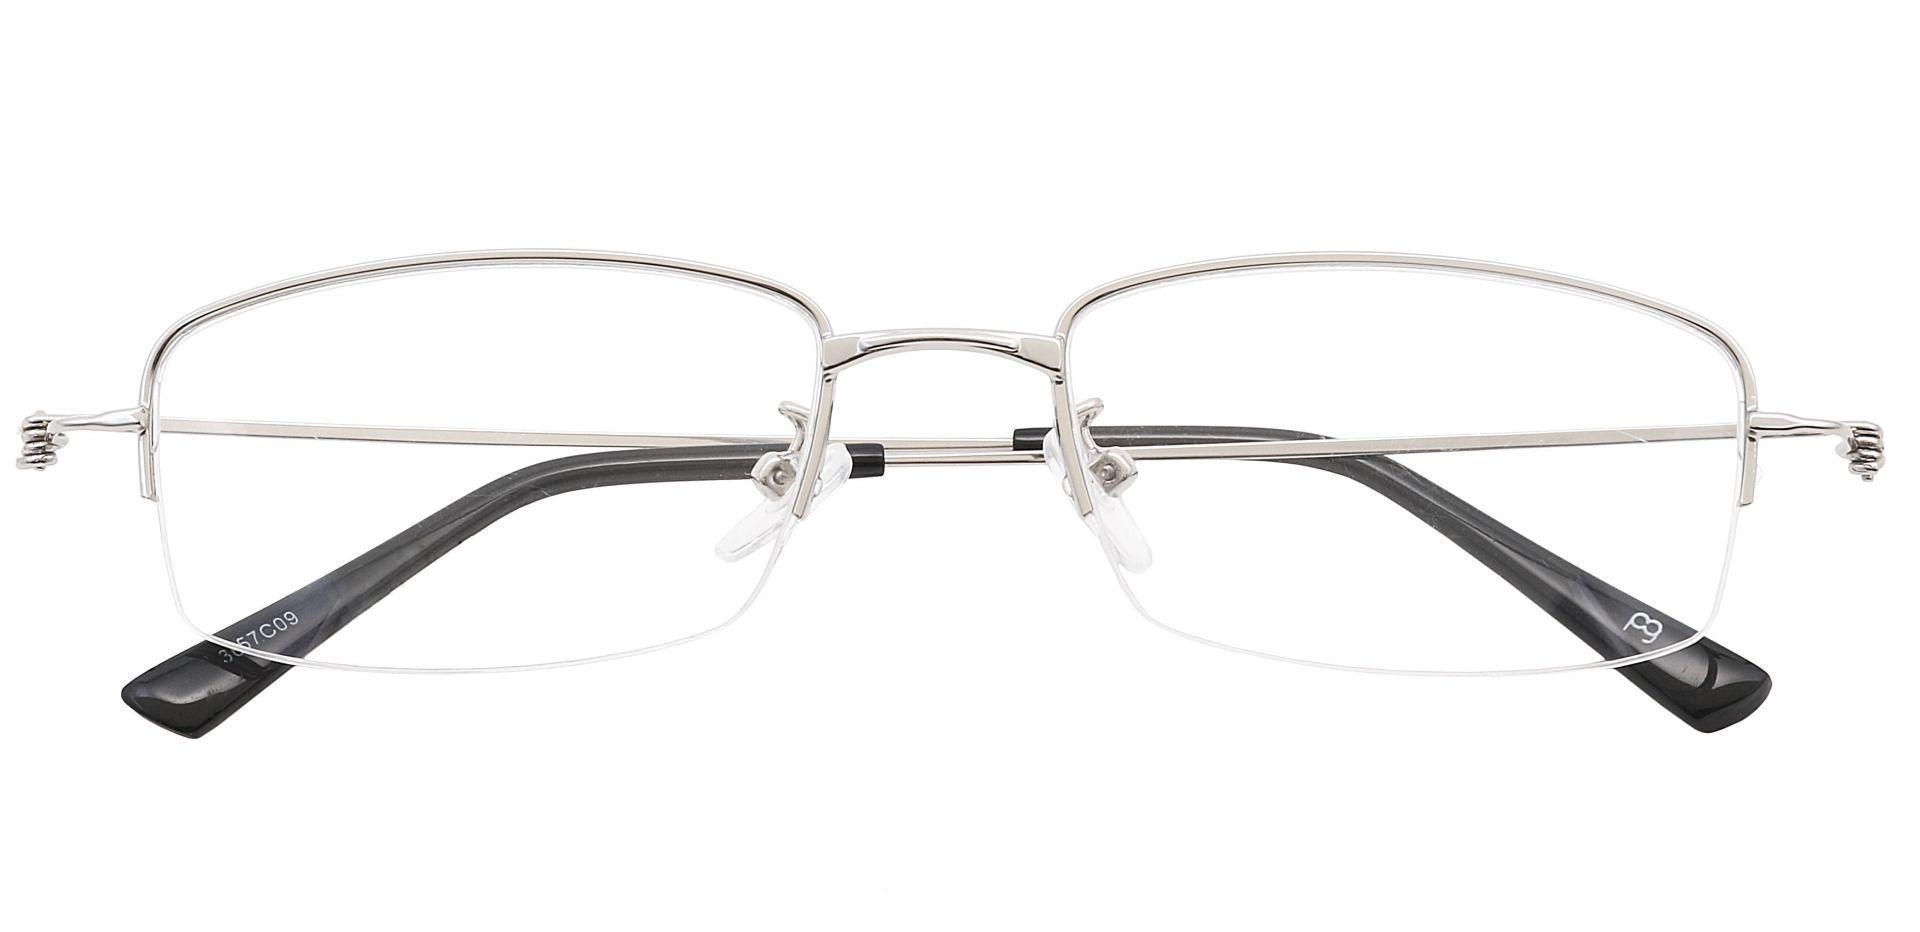 Wyoming Rectangle Prescription Glasses - Gray